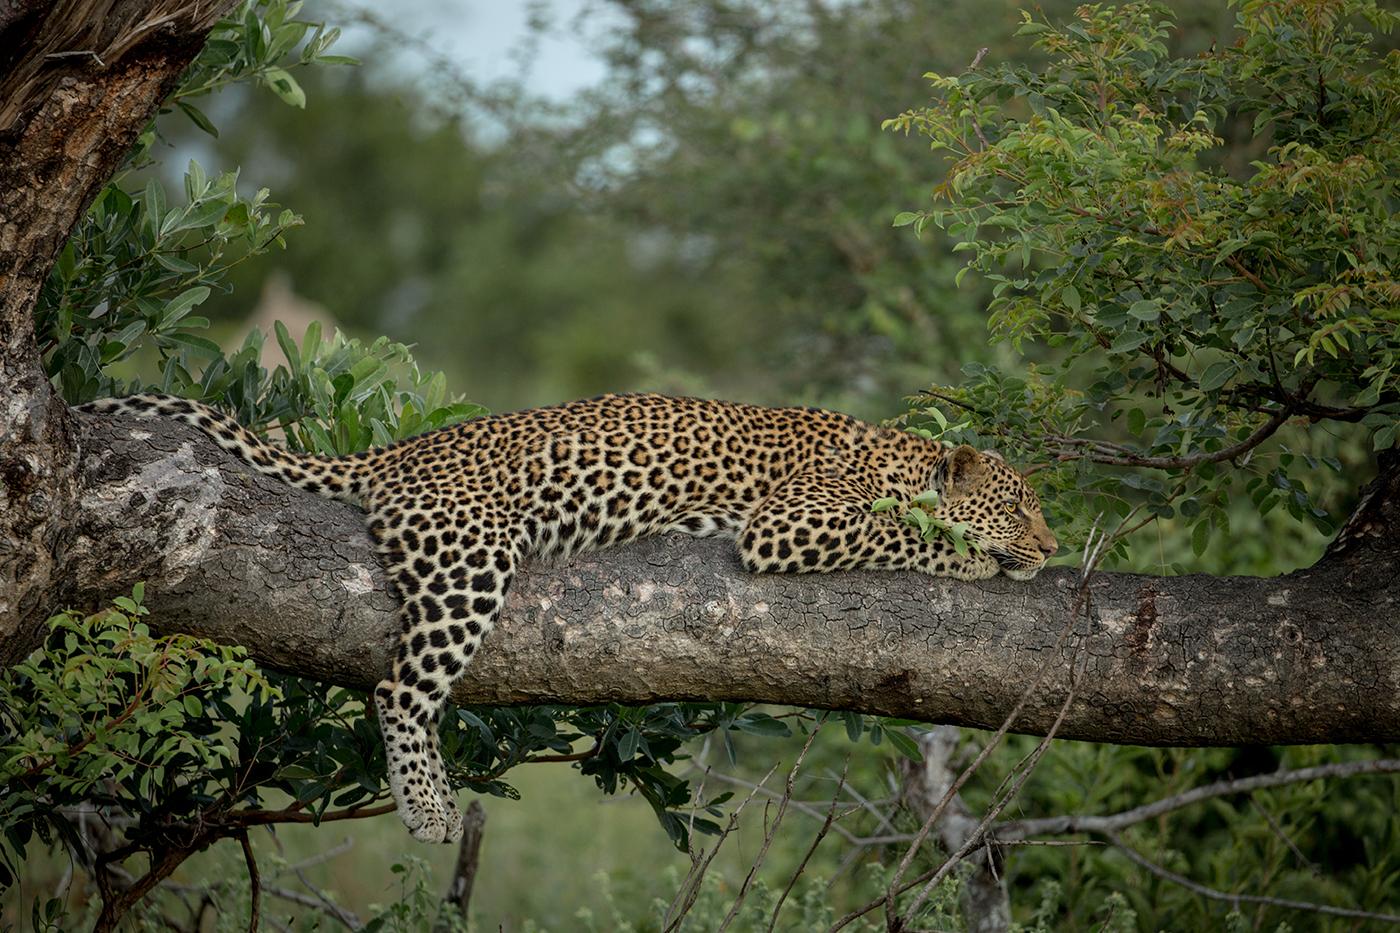 xidulu young male leopard, KJ